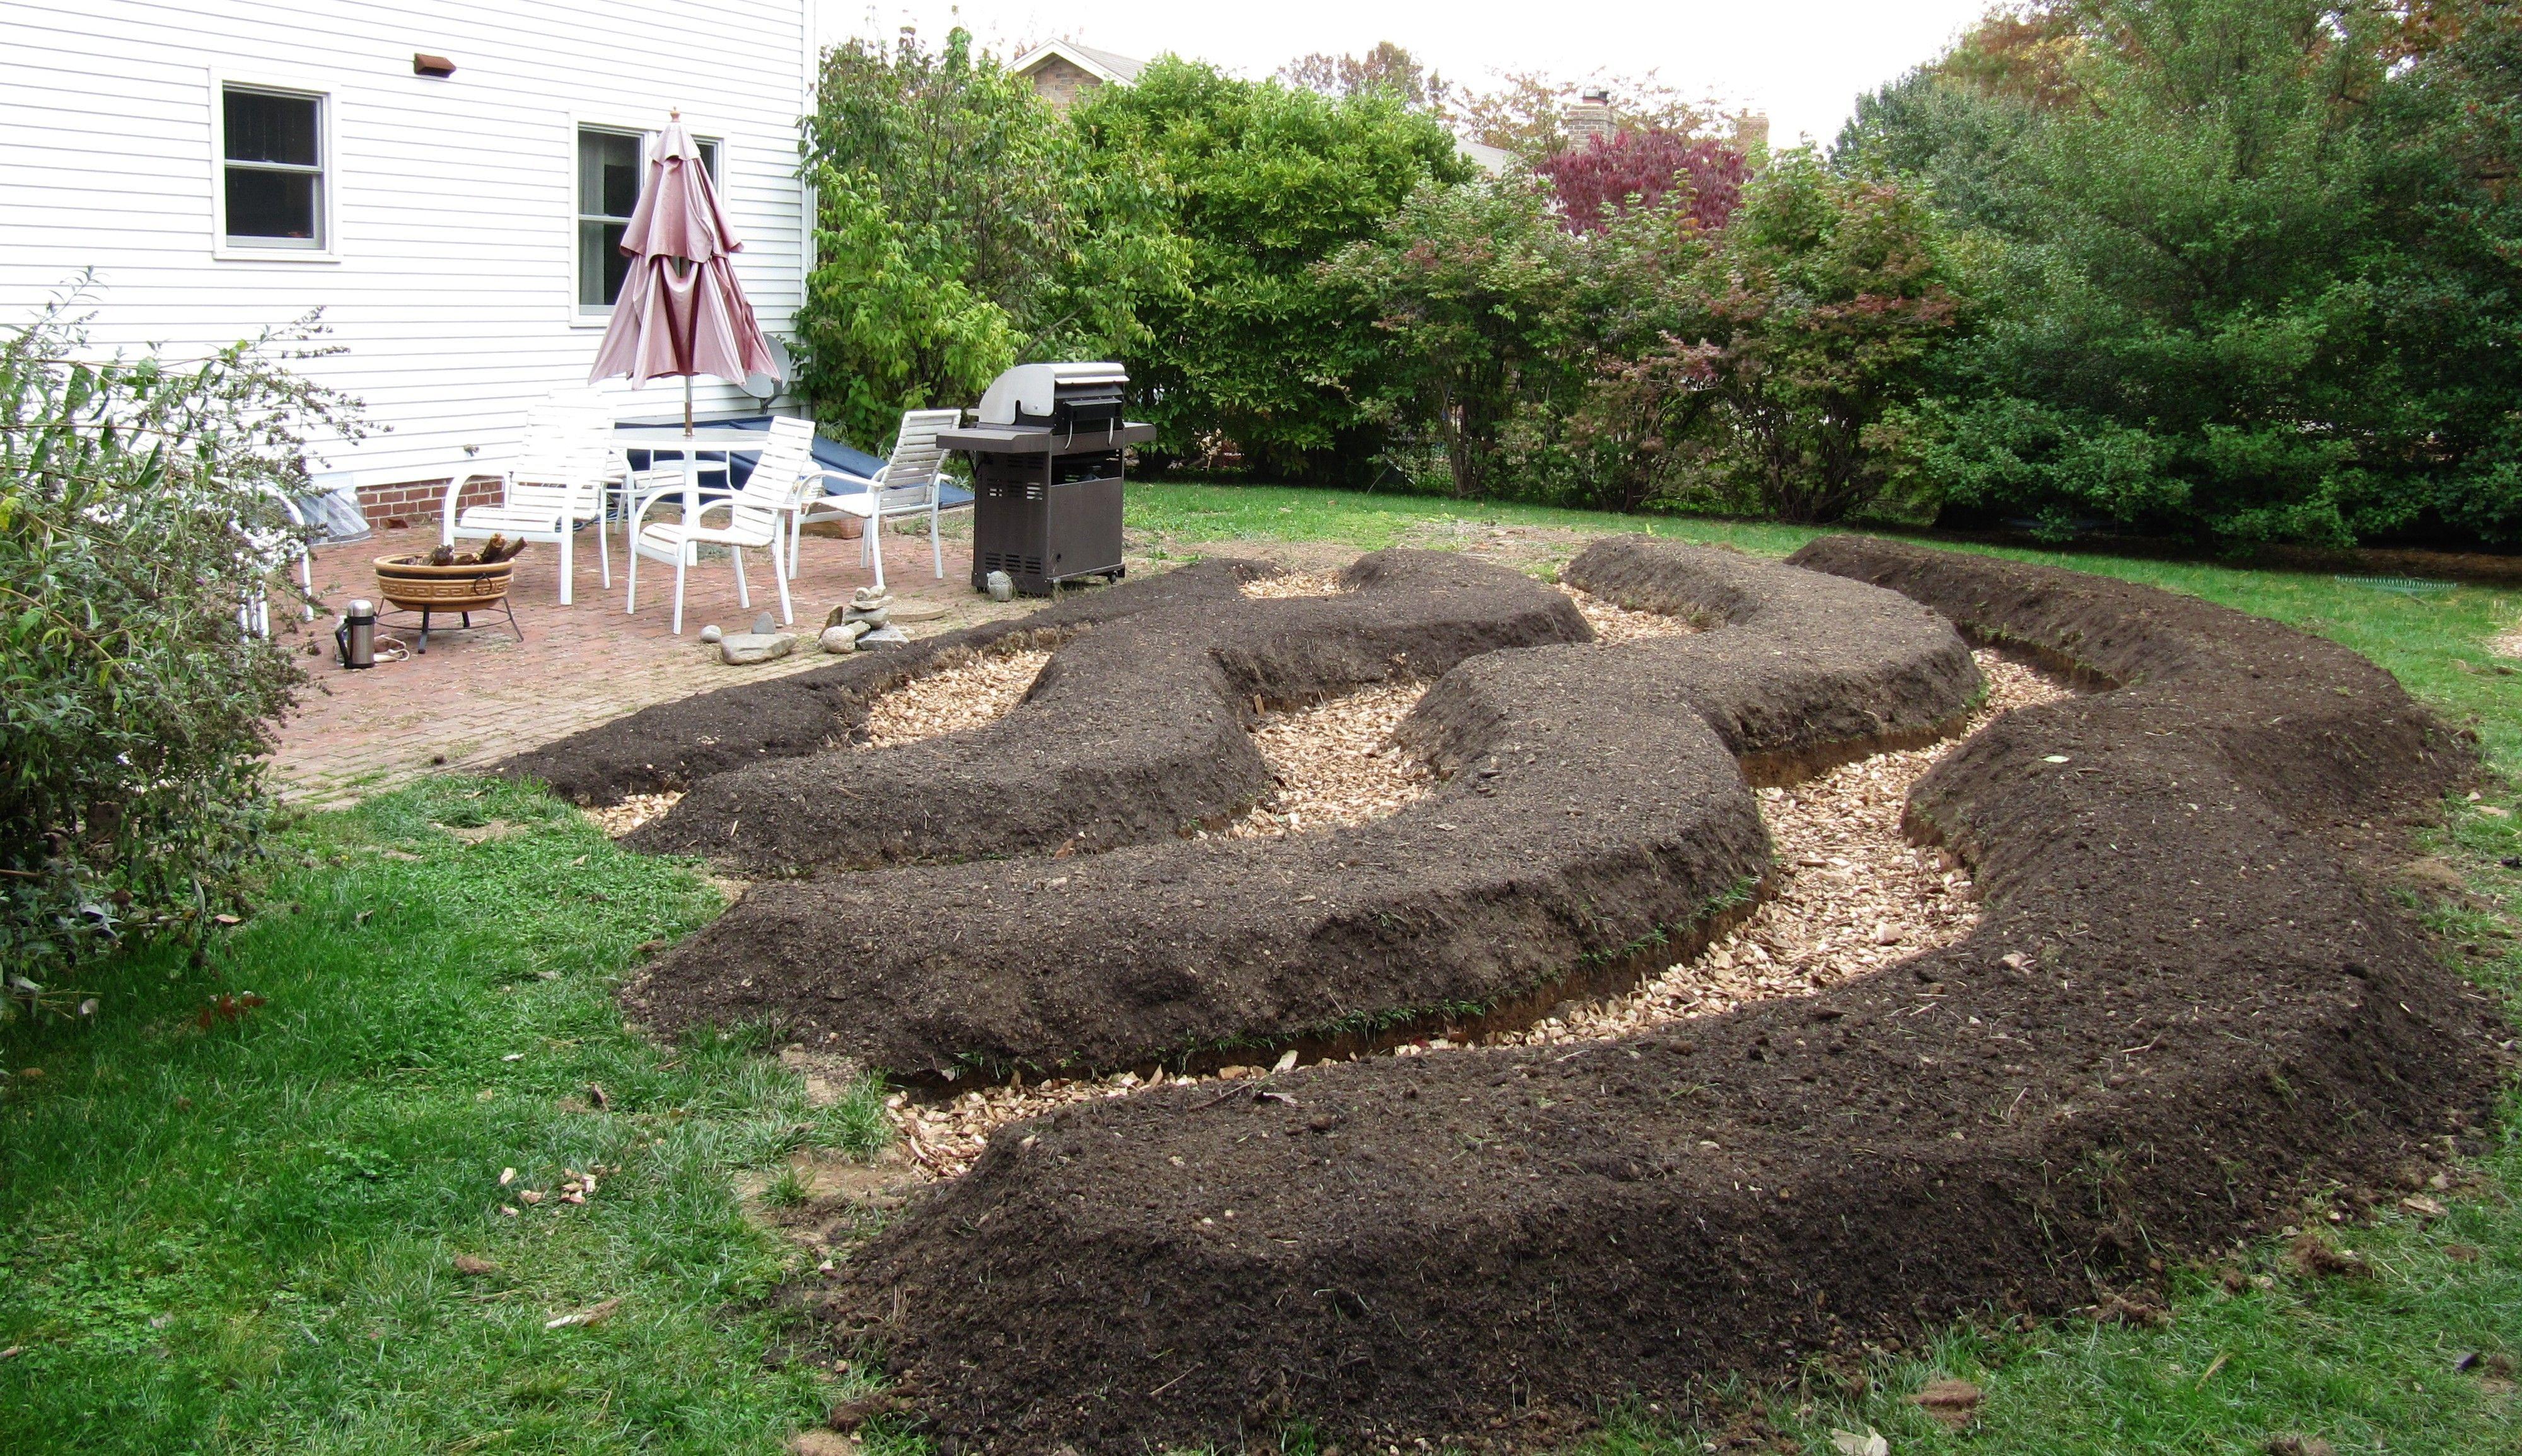 Inspiring Vegetable Garden Bed Designs Plans Family Food Garden Vegetable Garden Beds Permaculture Design Permaculture